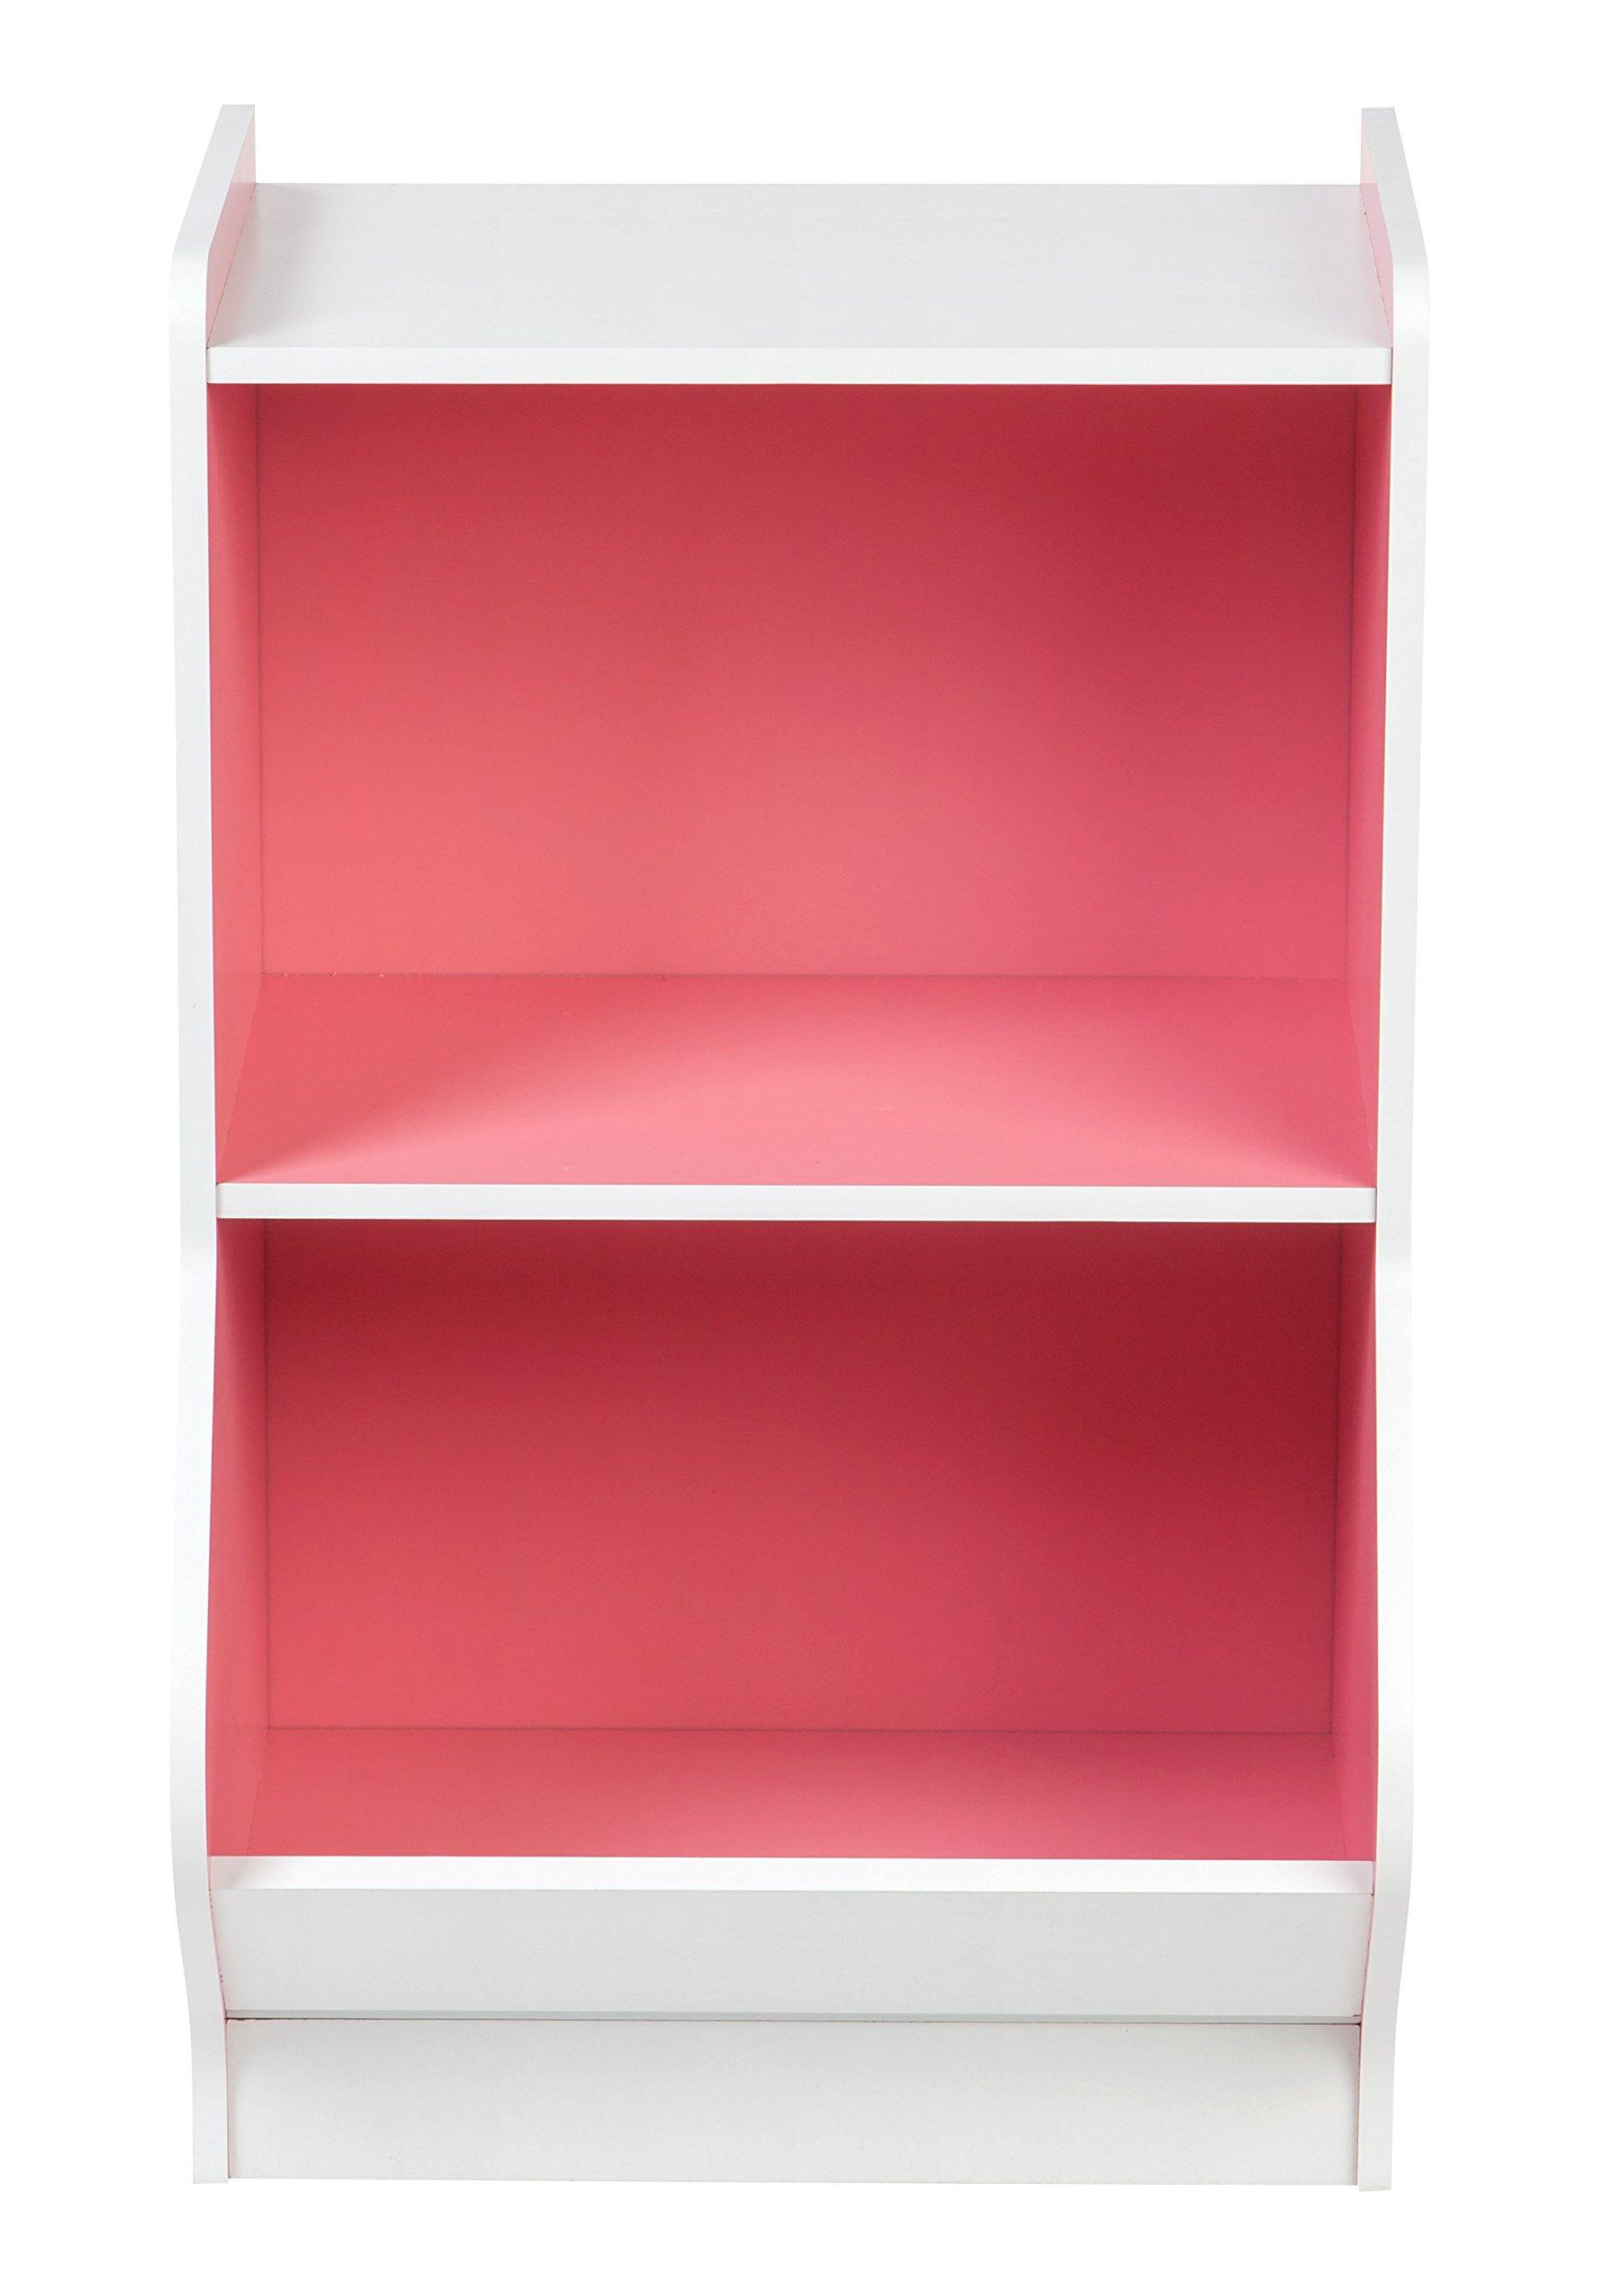 IRIS 2-Tier Storage Organizer Shelf with Footboard, White and Pink by IRIS USA, Inc. (Image #2)